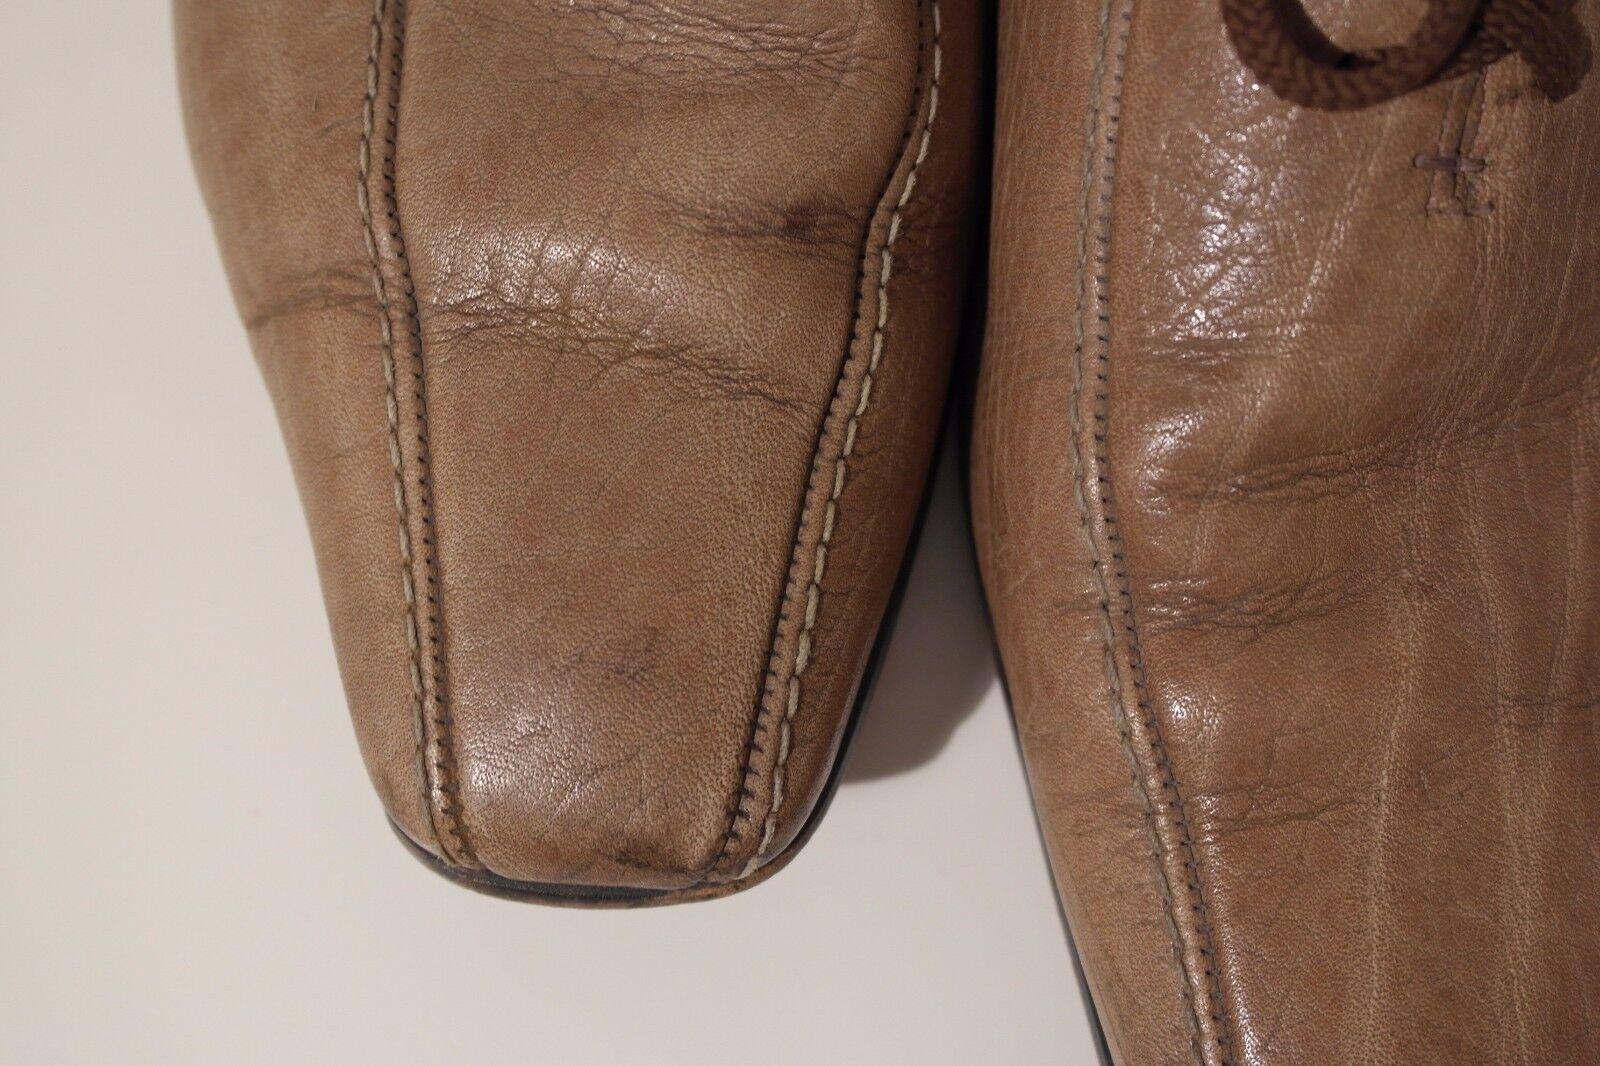 True Vintage 70er uomo lacci Scarpe Lace Up Marronee Marronee Marronee Scarpe Basse Loafer | In vendita  | Maschio/Ragazze Scarpa  f4c641